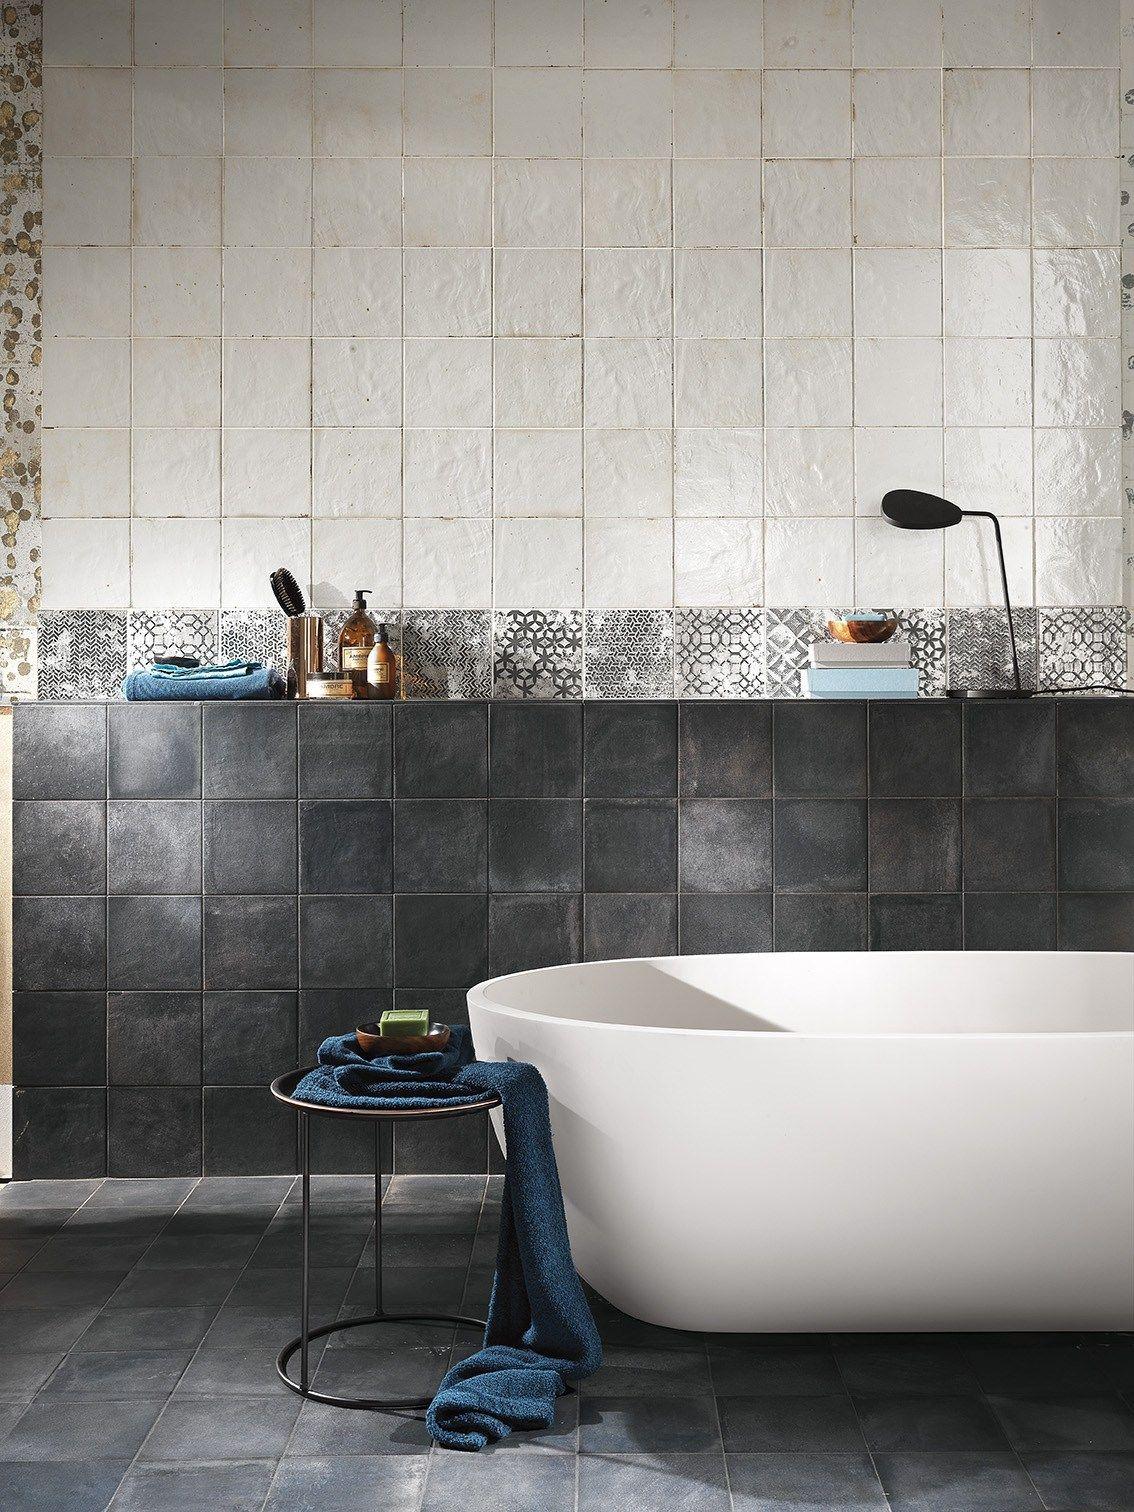 fap ceramiche at maison objet. Black Bedroom Furniture Sets. Home Design Ideas